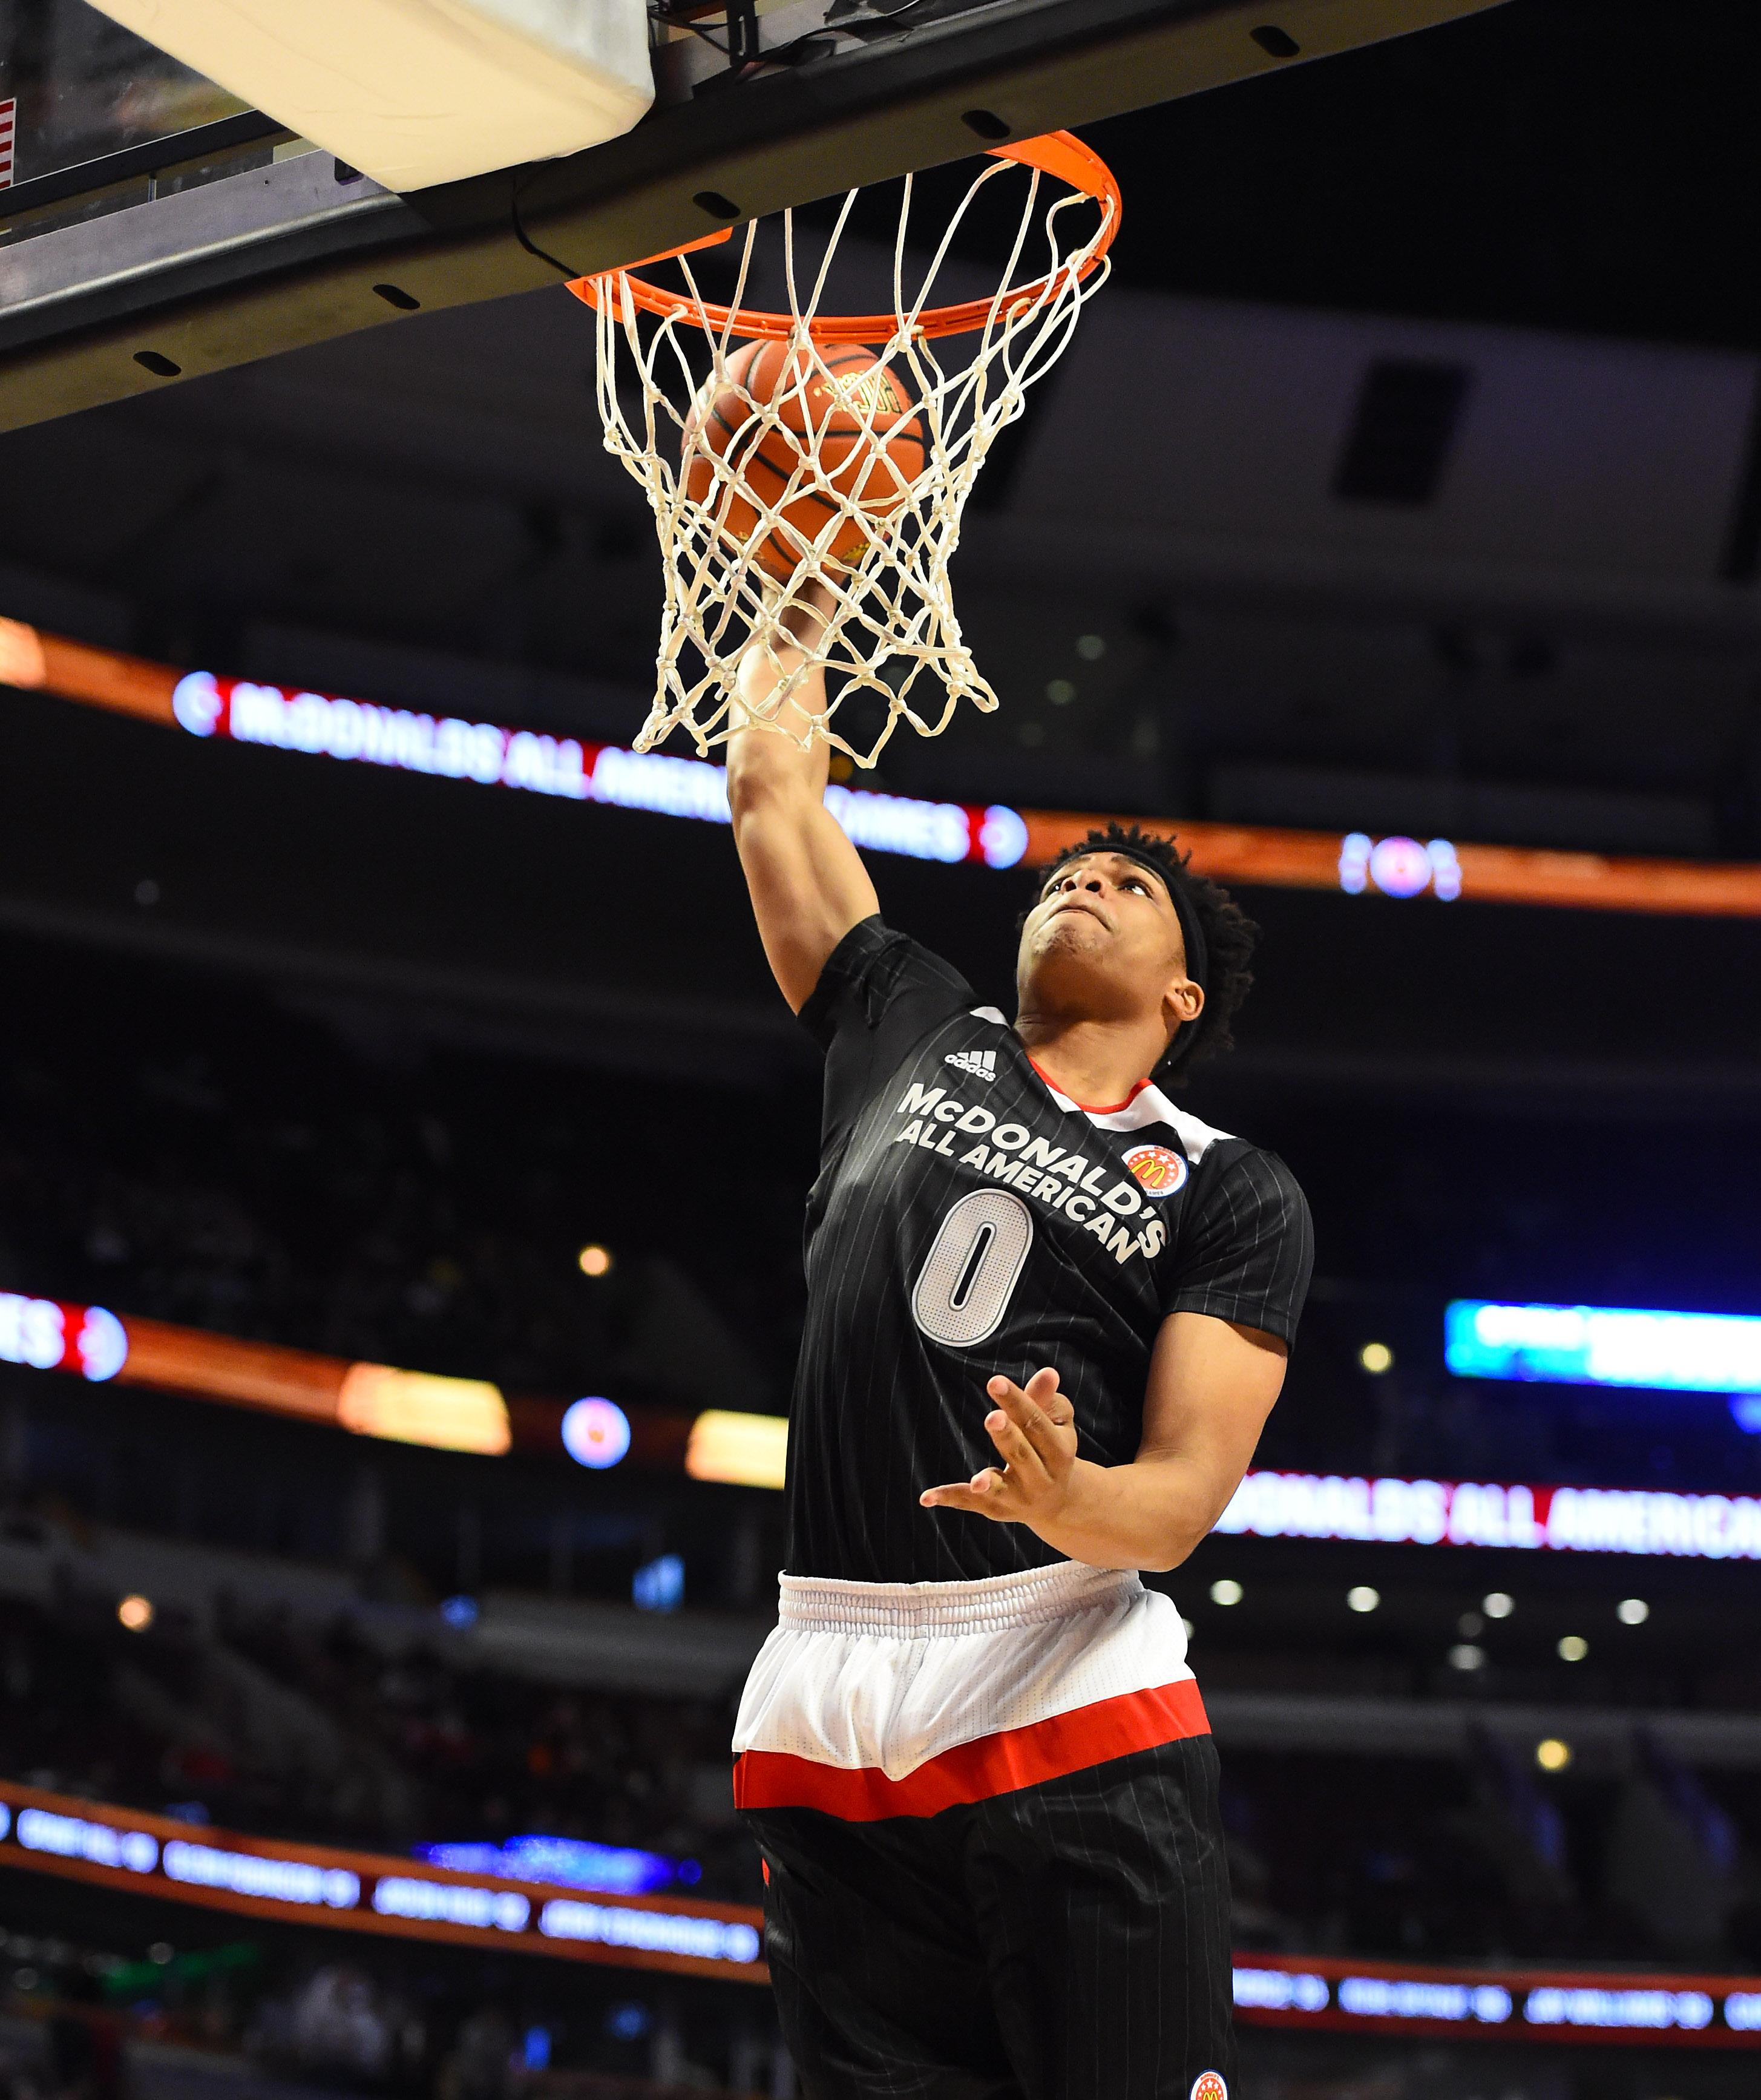 East's Miles Bridges (0) dunks (Photo: Mike DiNovo, USA TODAY Sports)